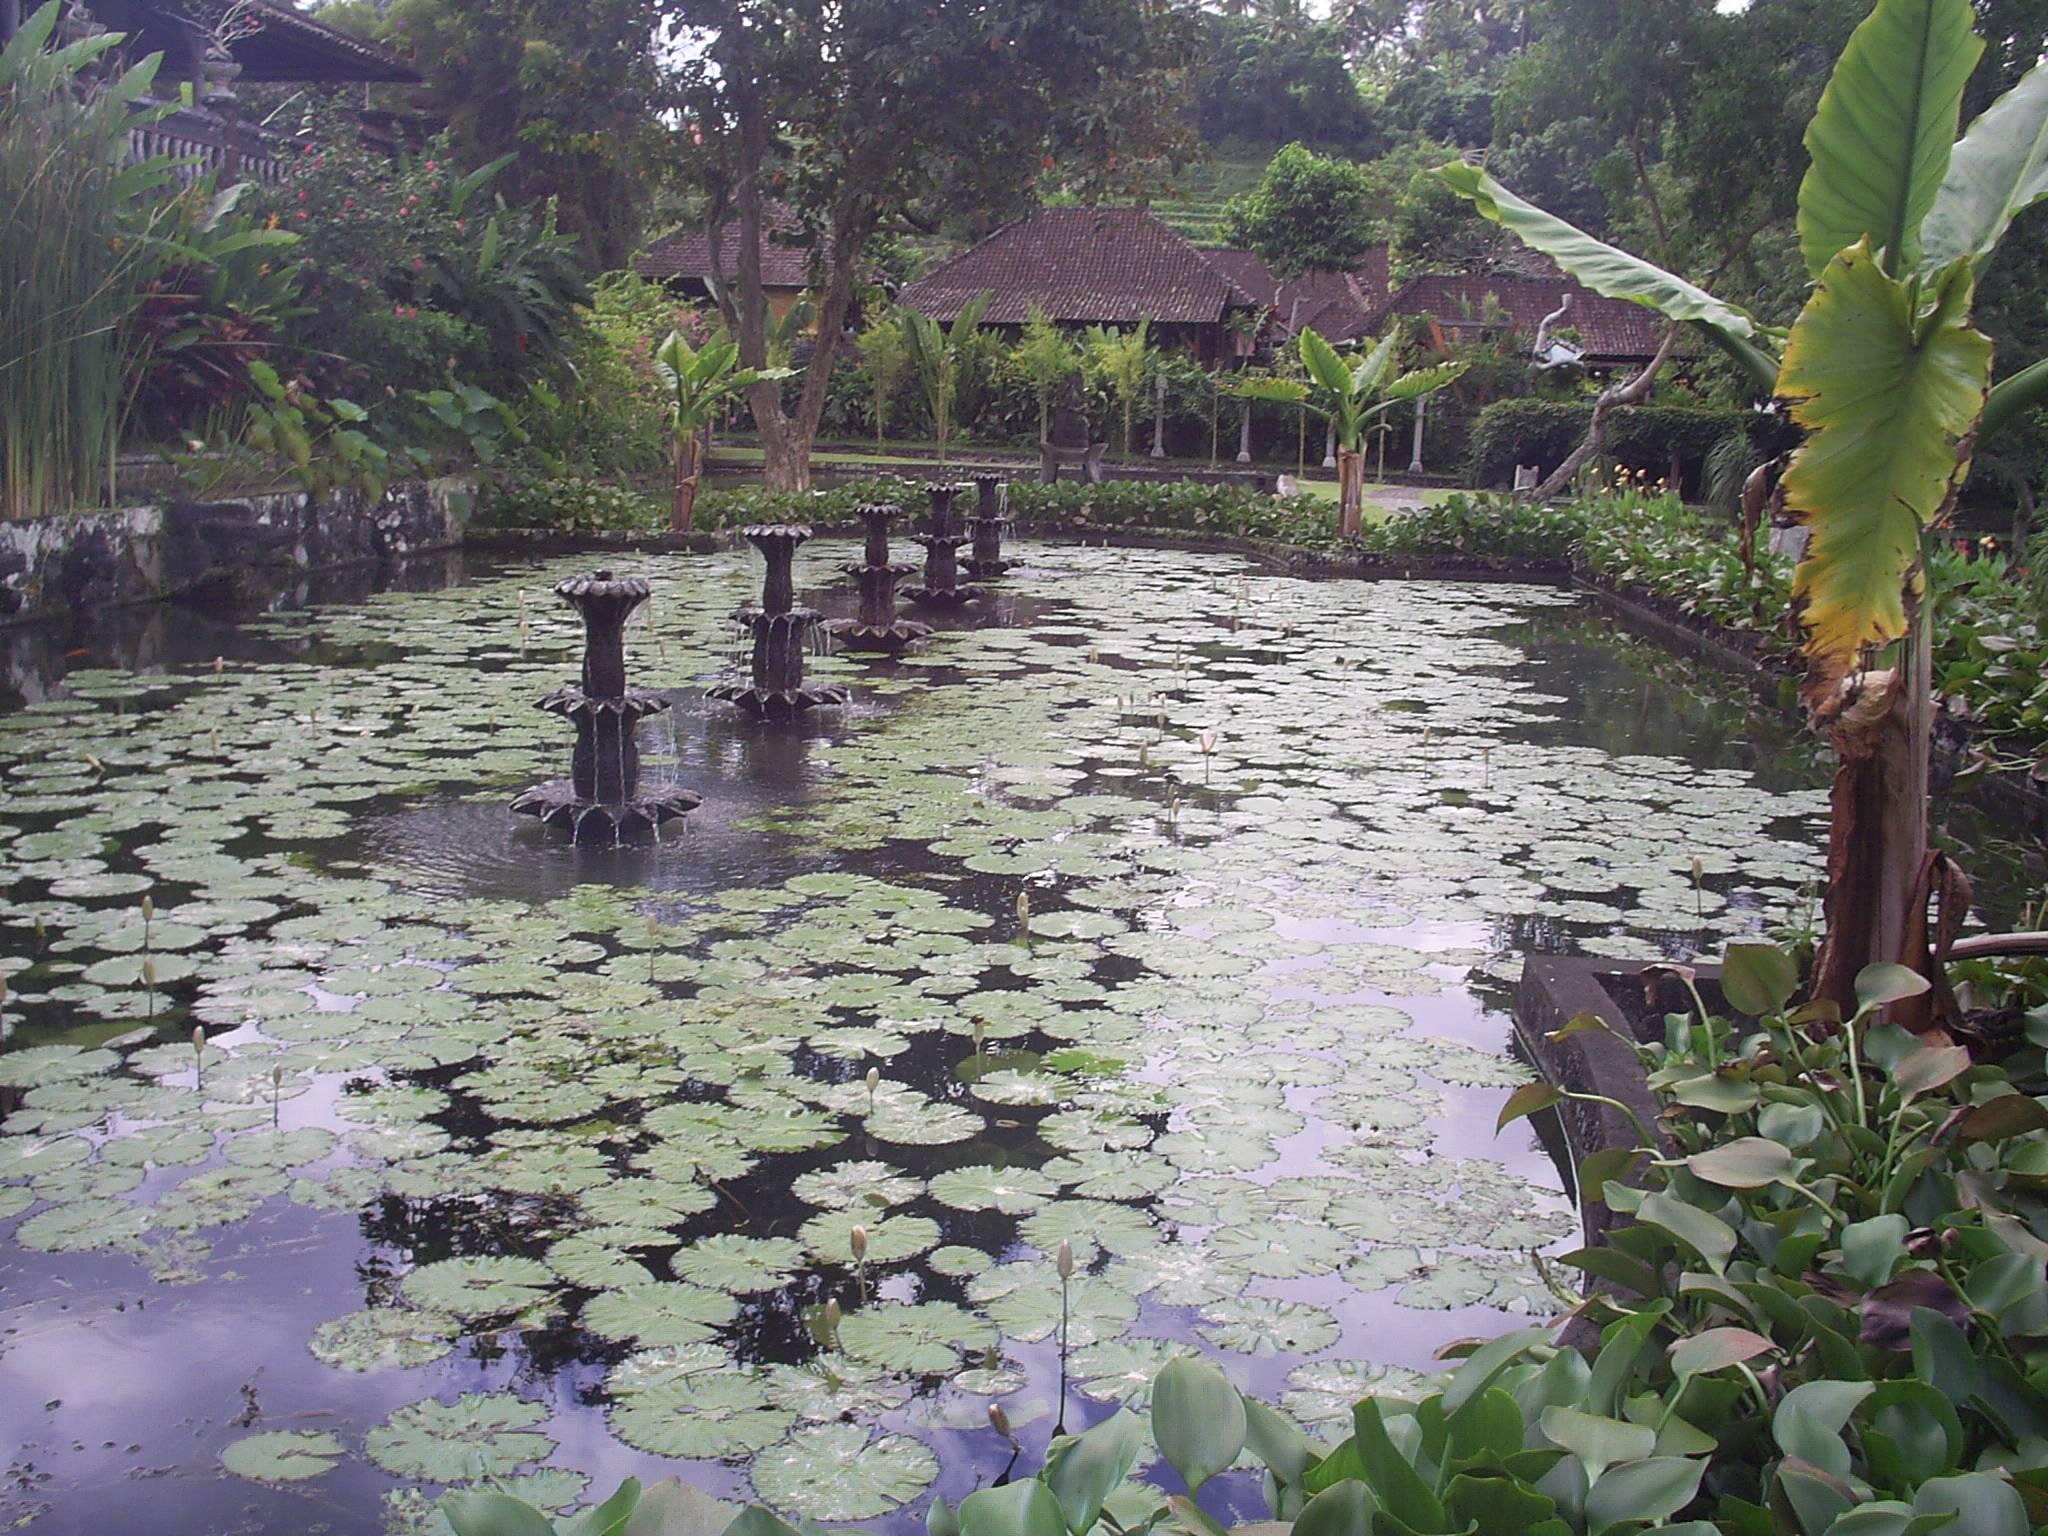 Photo 2: Tirta Gangga, le palais de l'eau